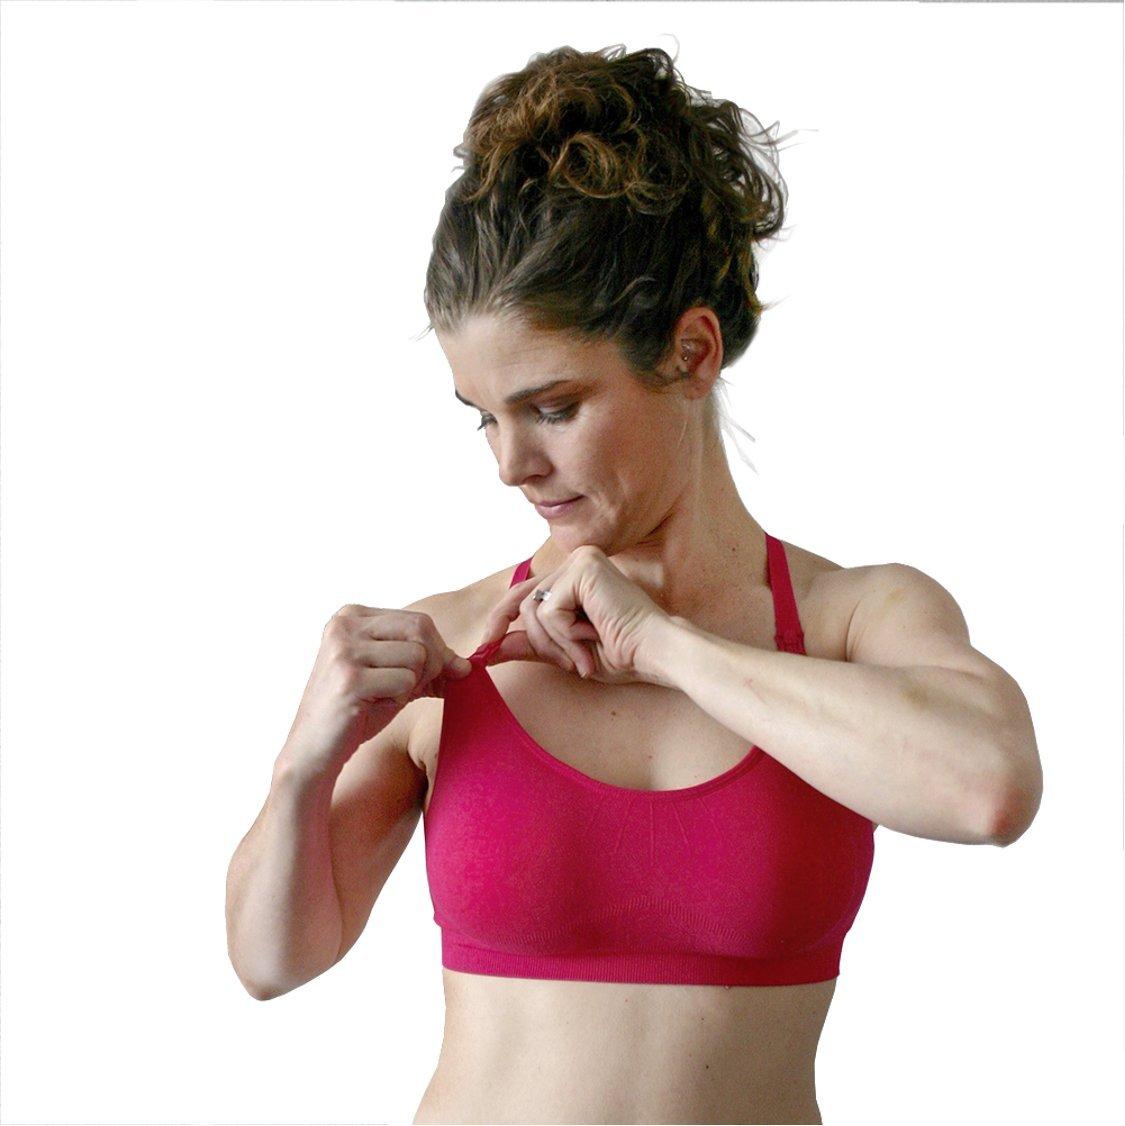 b46d38fabc528 Get Quotations · bamboobies Maternity Seamless Yoga Nursing Bra for Breastfeeding  with Extender